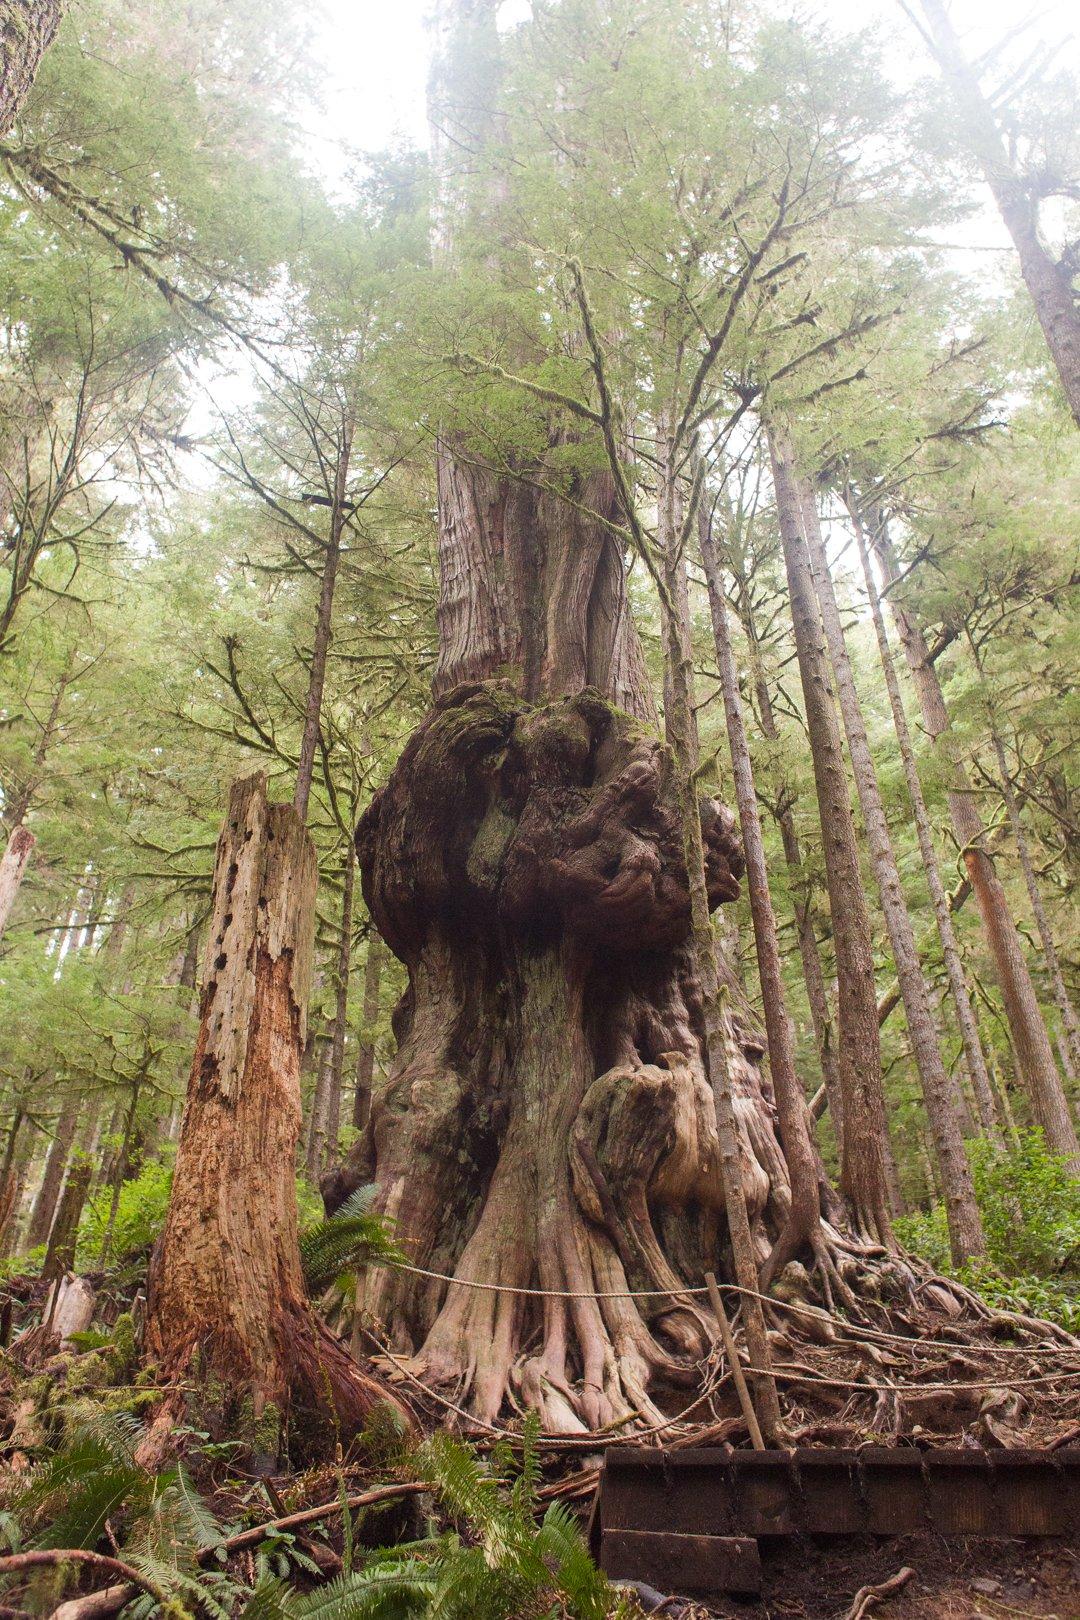 Avatar Grove near Port Renfrew on Vancouver Island